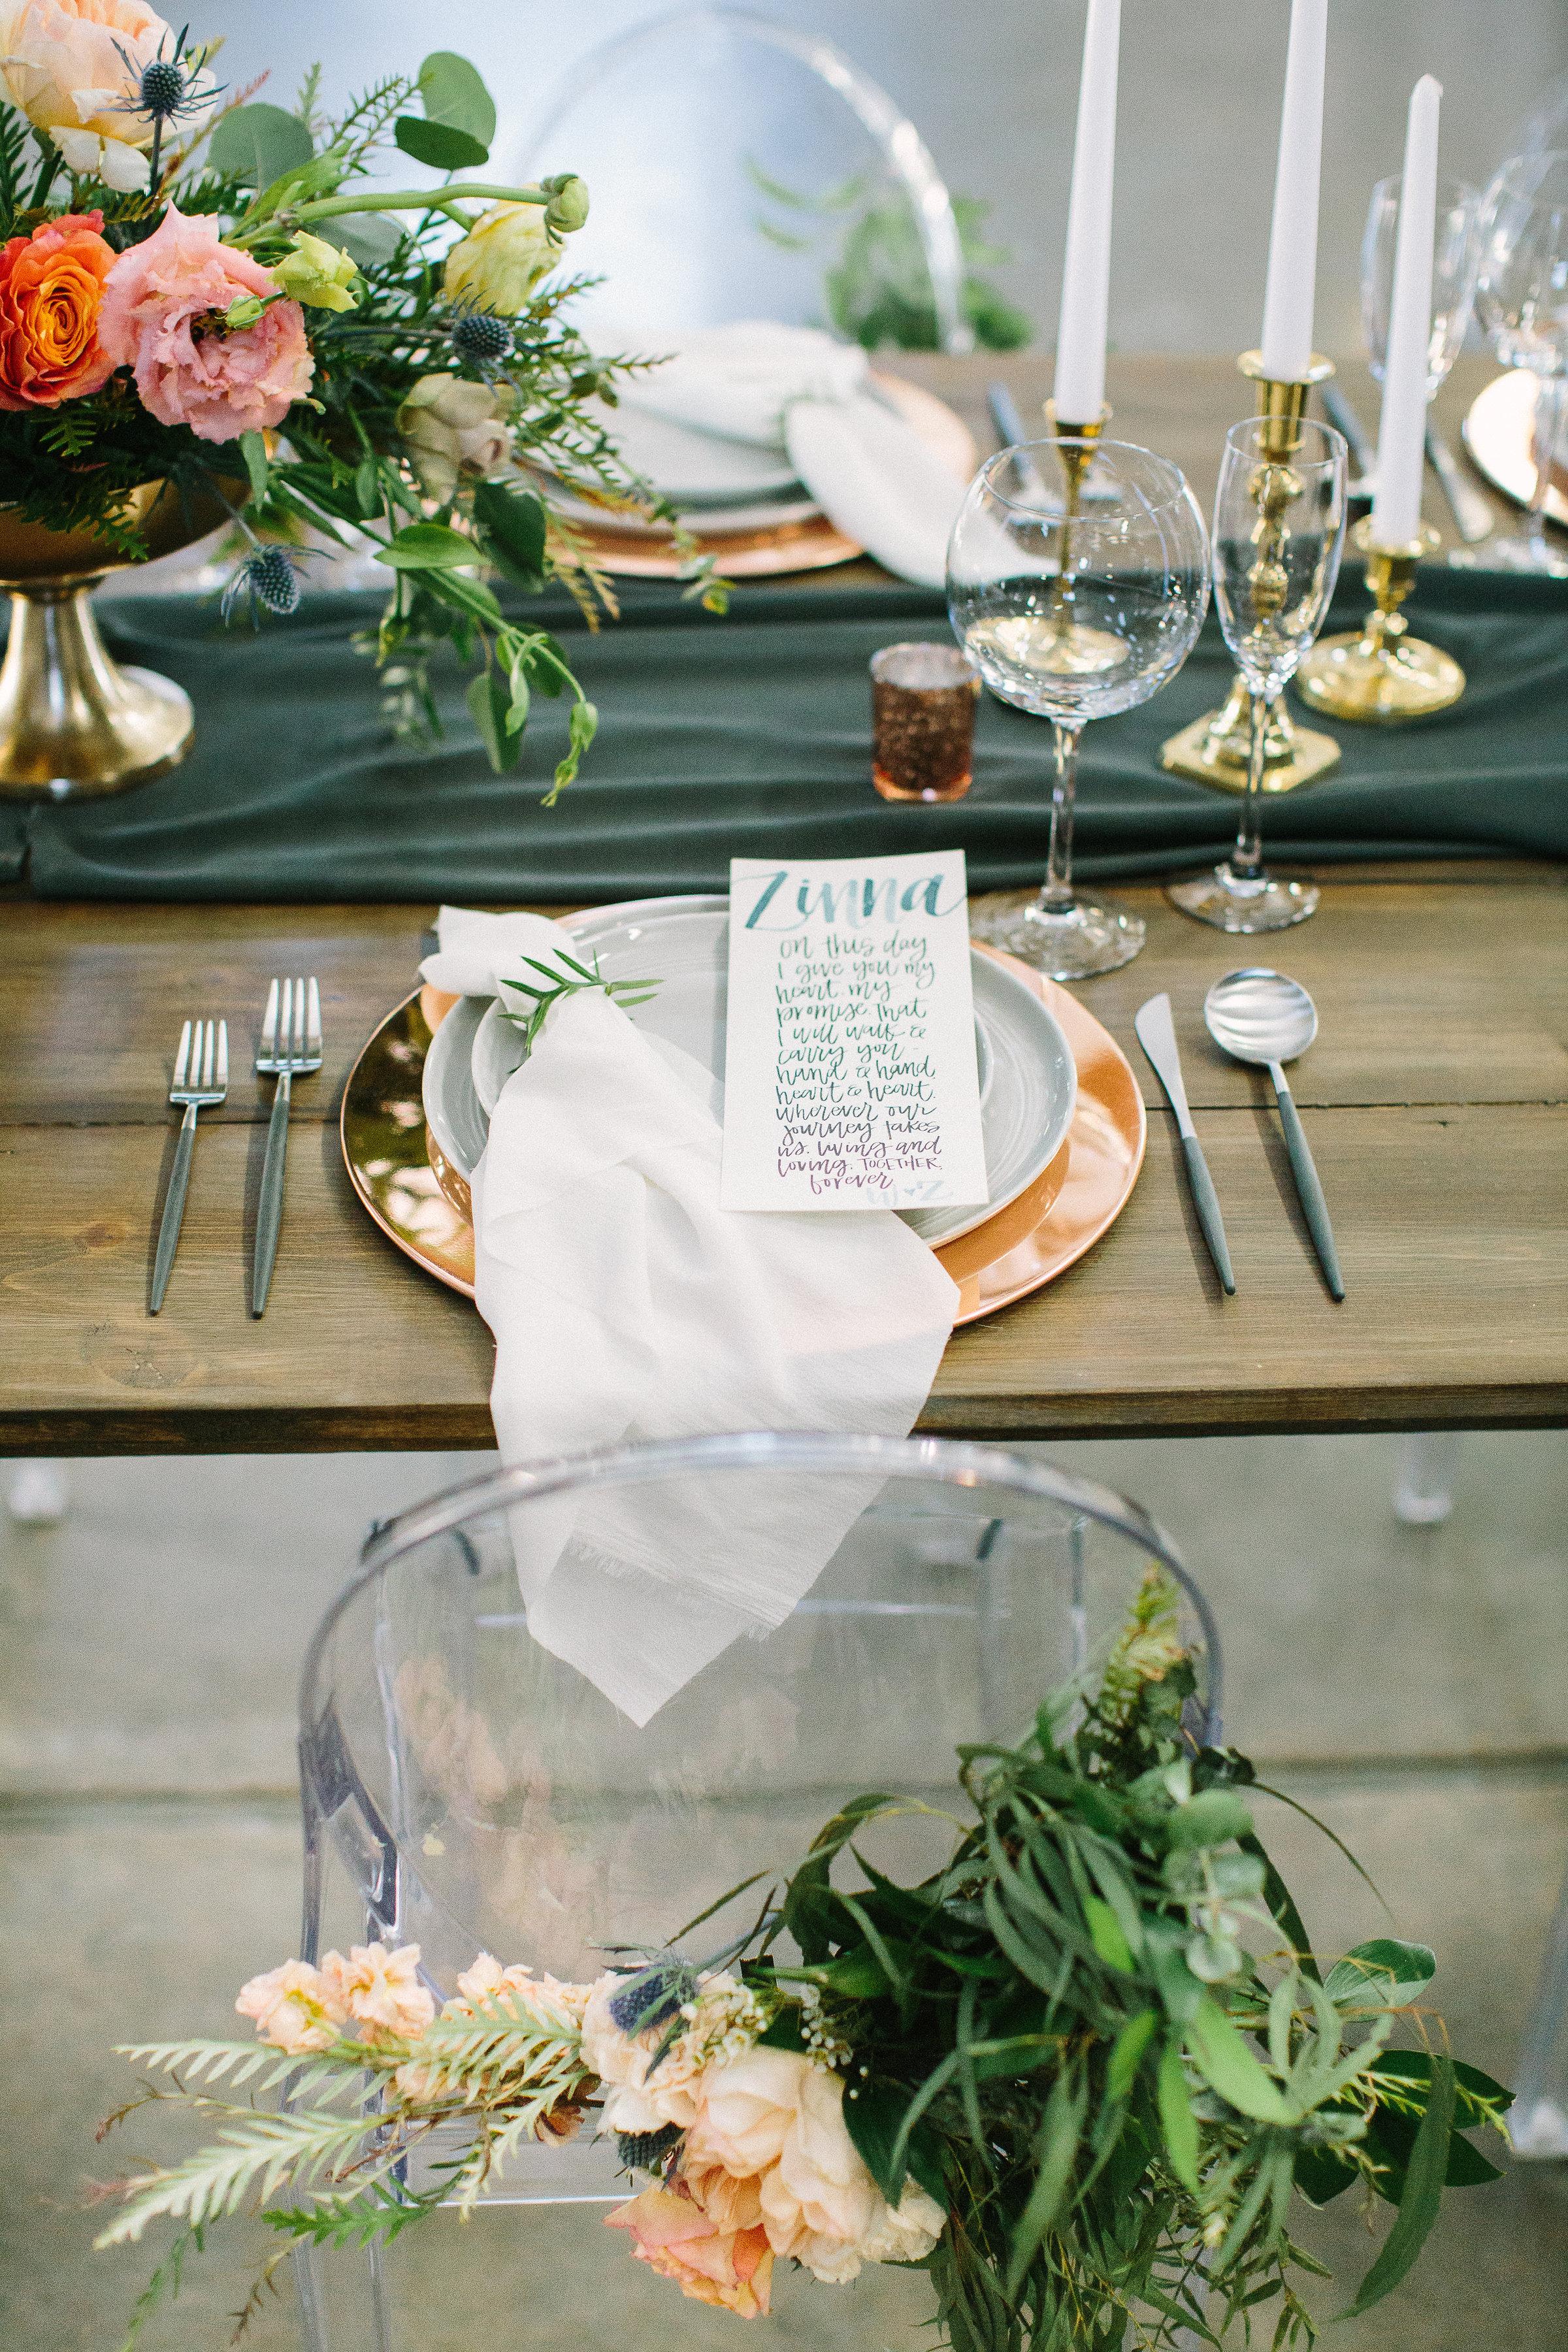 Ellen-Ashton-Photography-Peach-Creek-Ranch-Weddings-Wed-and-Prosper92.jpg